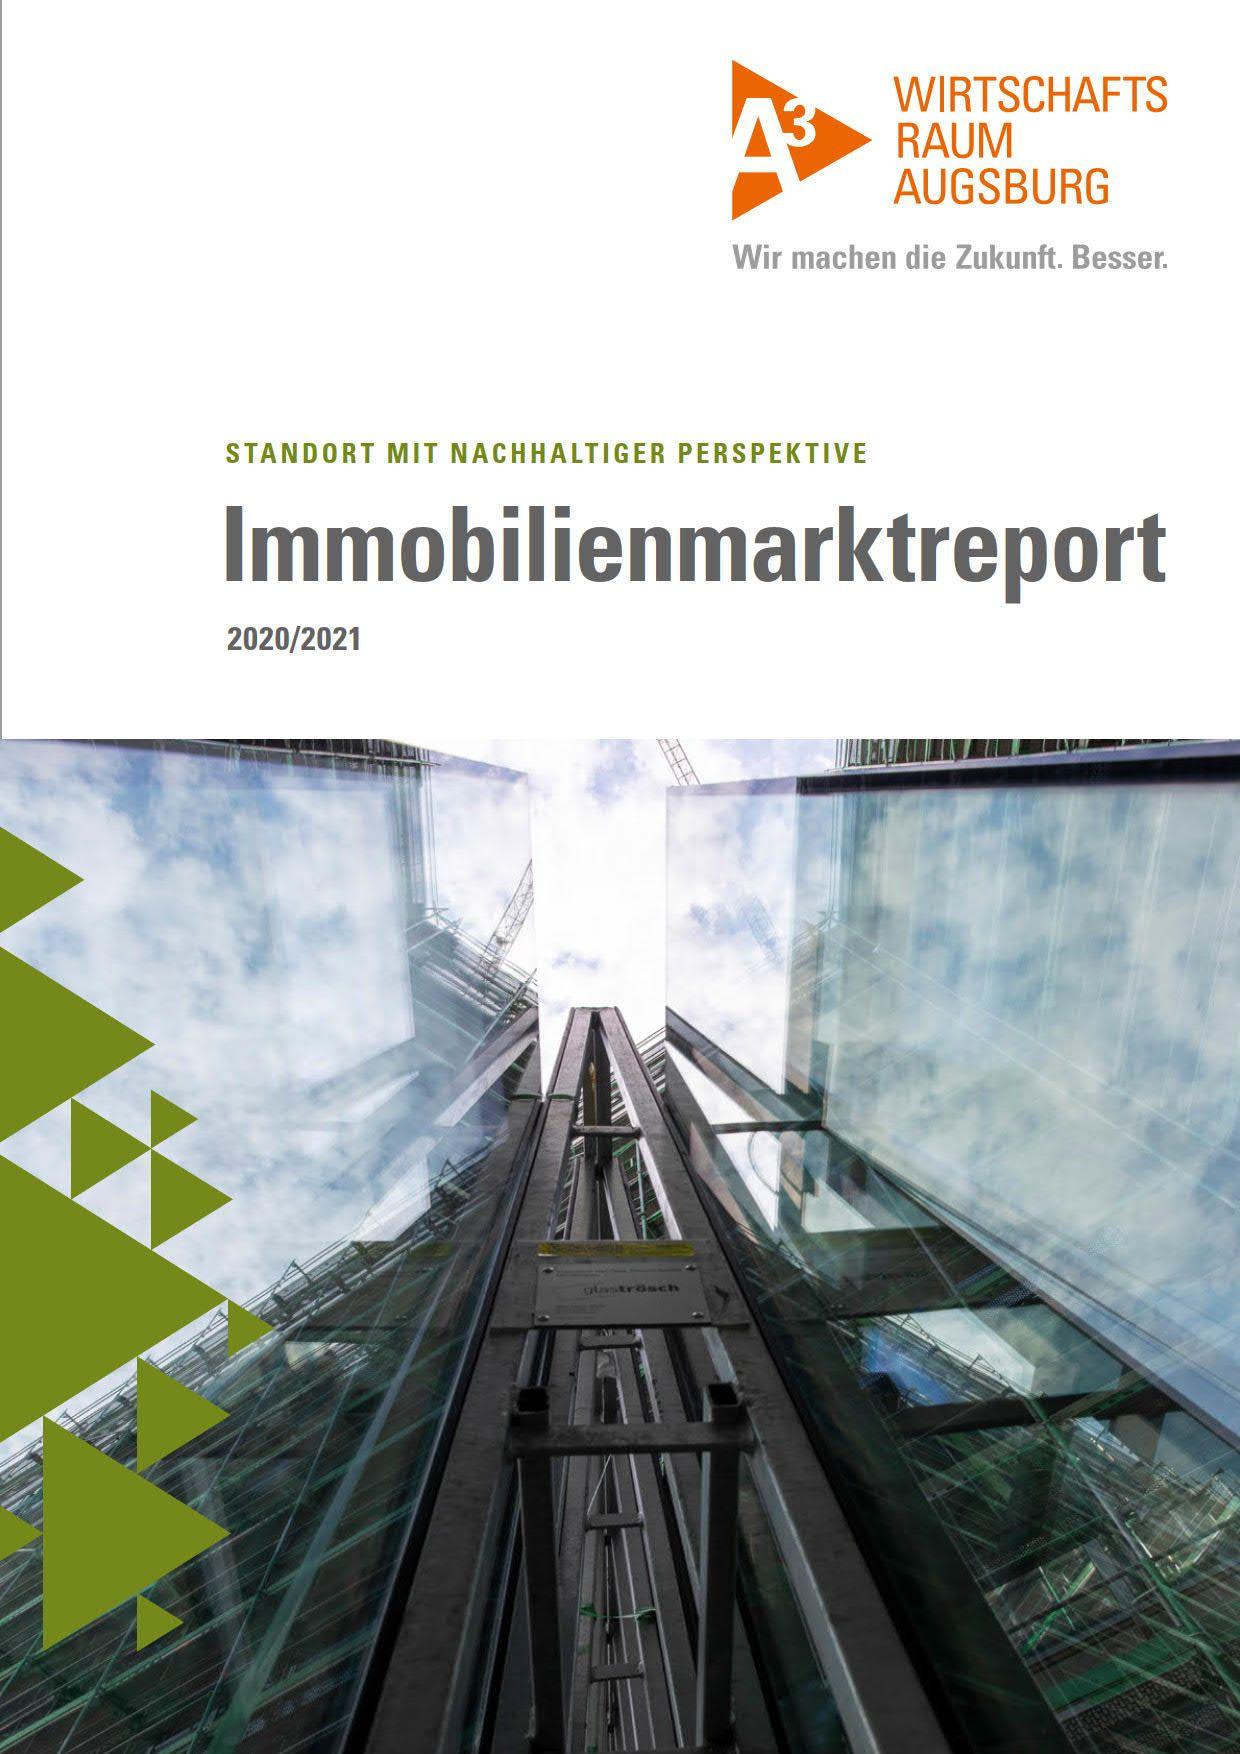 A3 Immobilienmarktreport